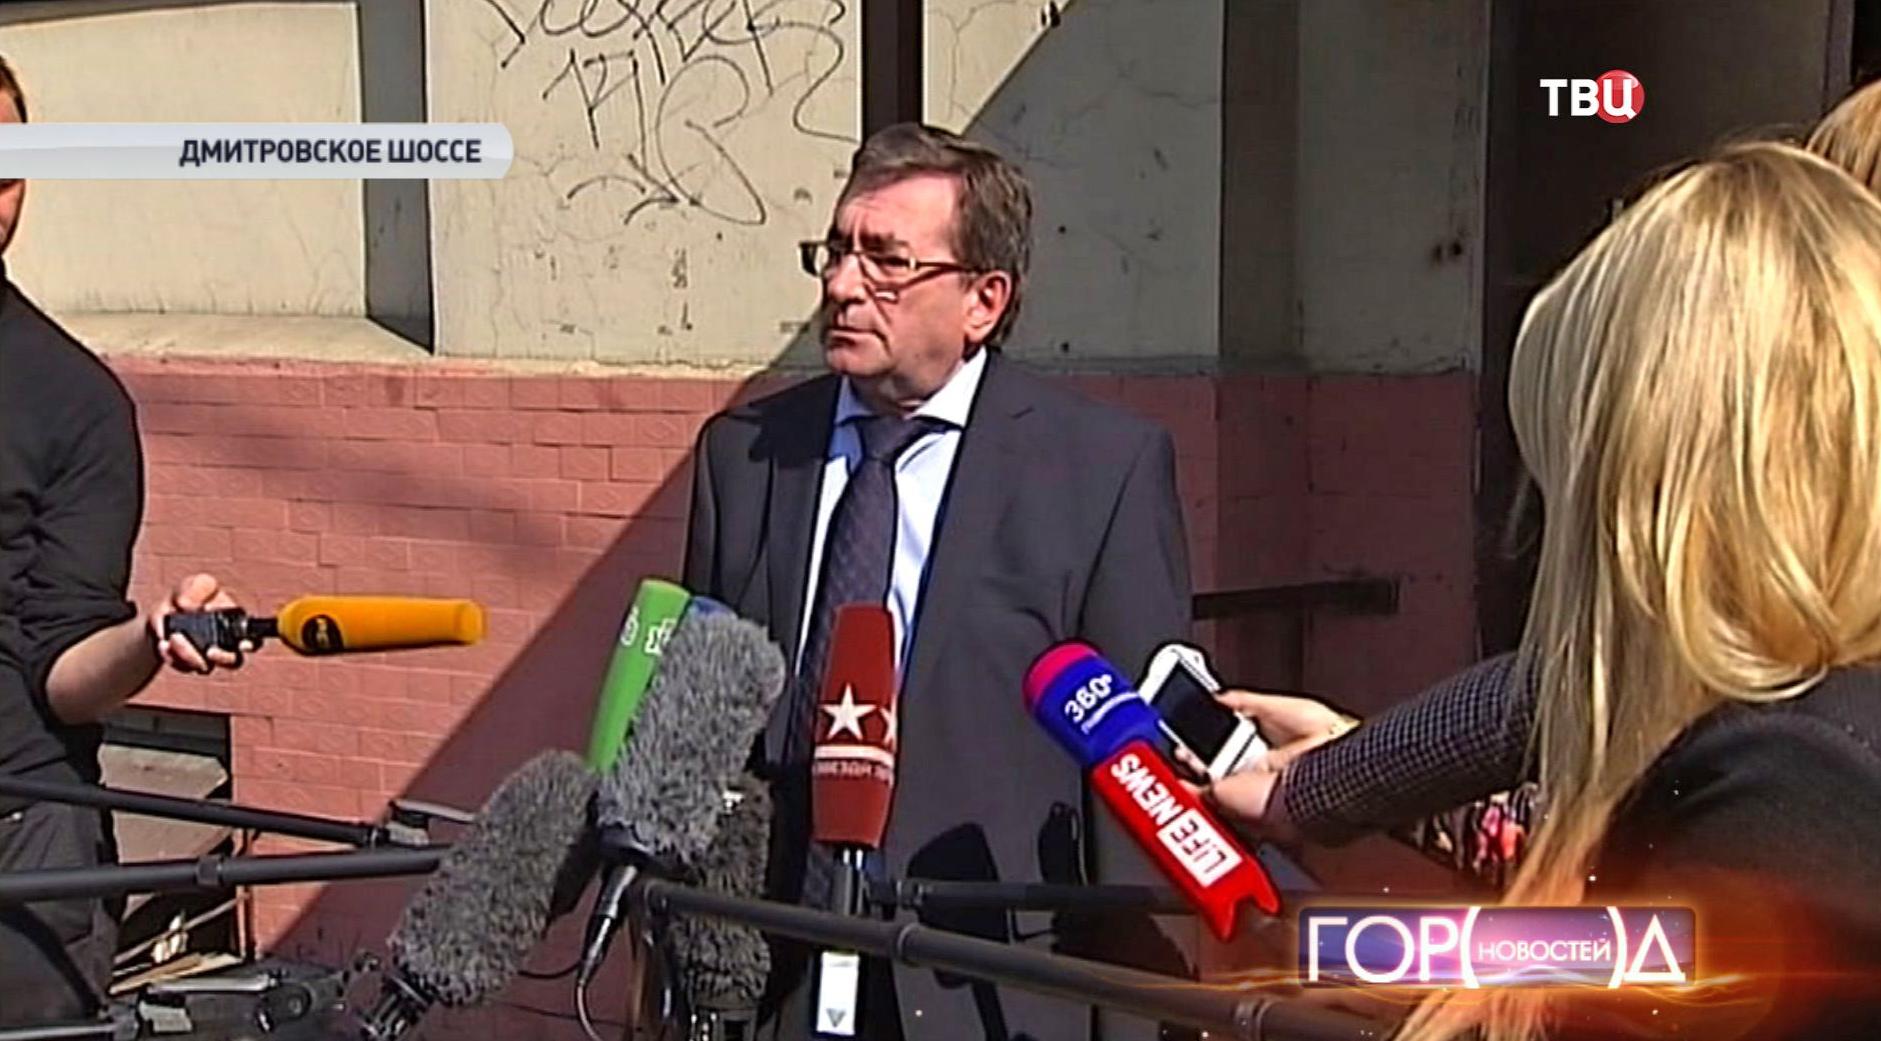 Адвокат подсудимого Владимир Левин